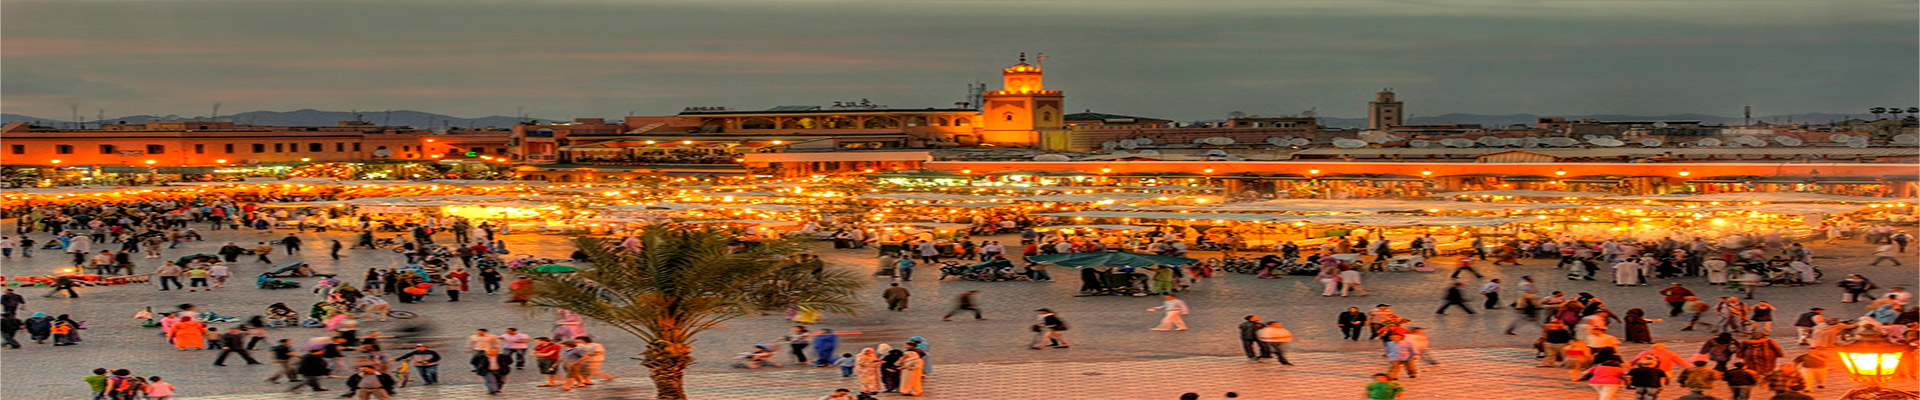 Maravilhas de Marrocos e Tunisia